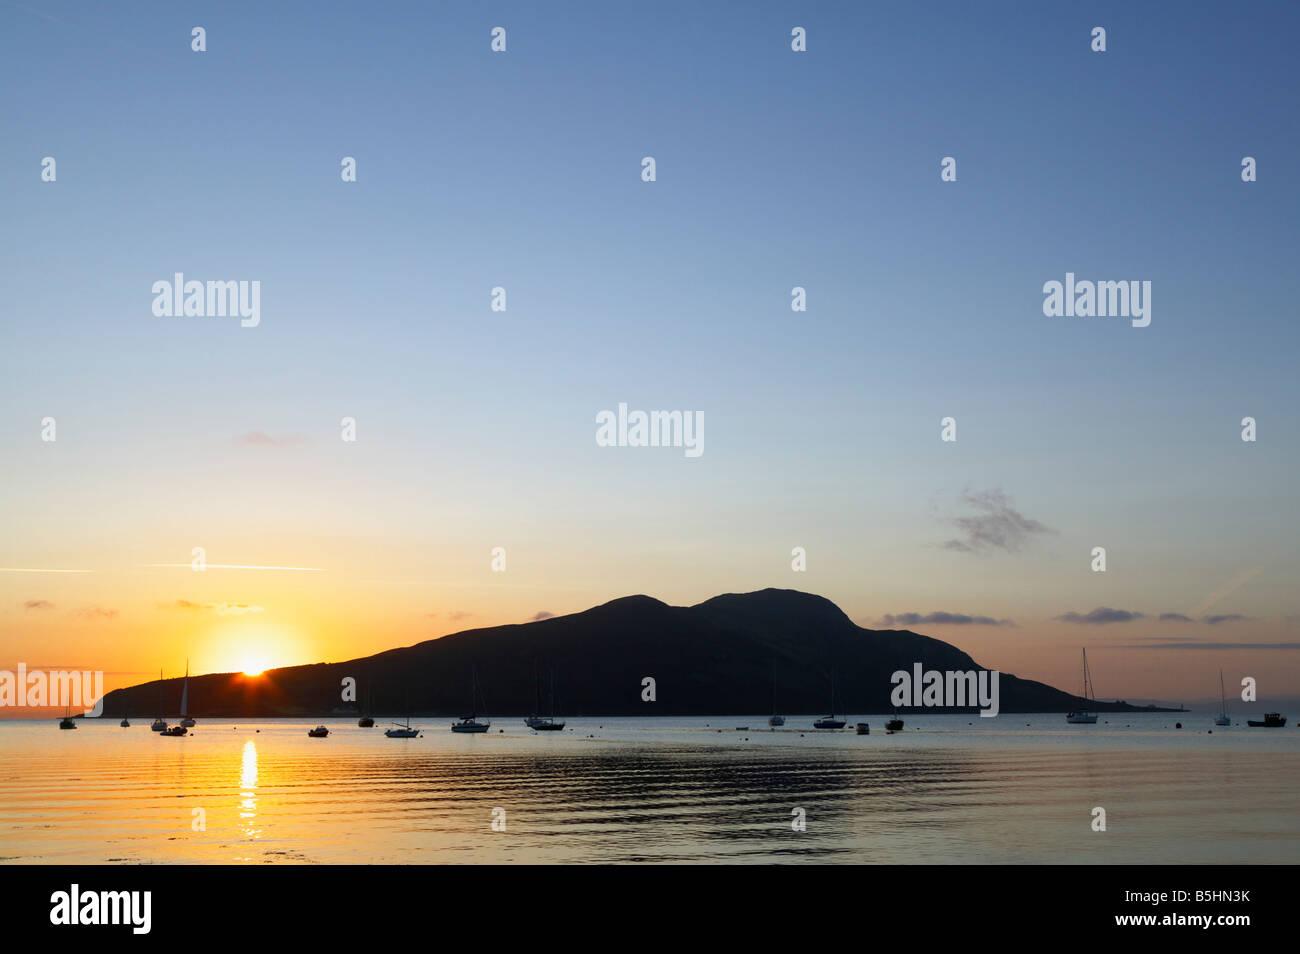 Holy Island off Isle of Arran, North Lanarkshire, Scotland, UK. Seen across Lamlash Bay at sunrise. - Stock Image